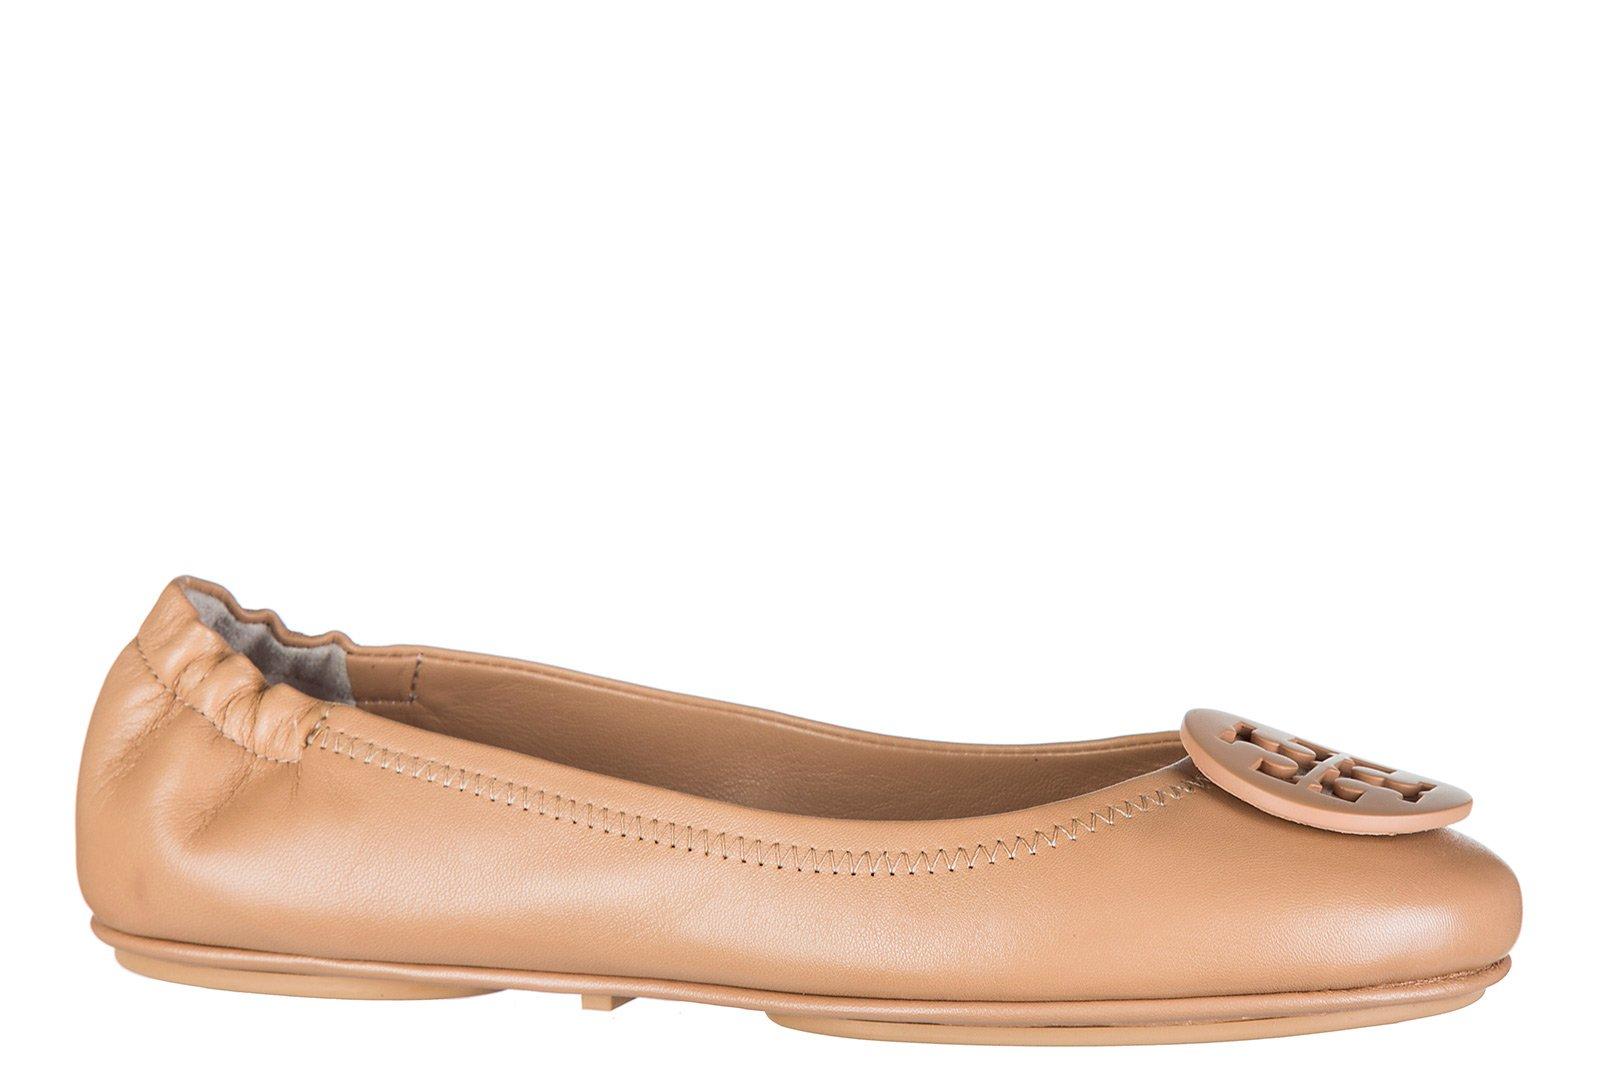 Tory Burch Women's Leather Ballet Flats Ballerinas Minnie Brown US Size 7.5 51158251254 image https://media.buyr.com/yFlfHexwLYGqNP6QWtlKqw-Jn6YtMOXxET3itraigZbxw.jpg1